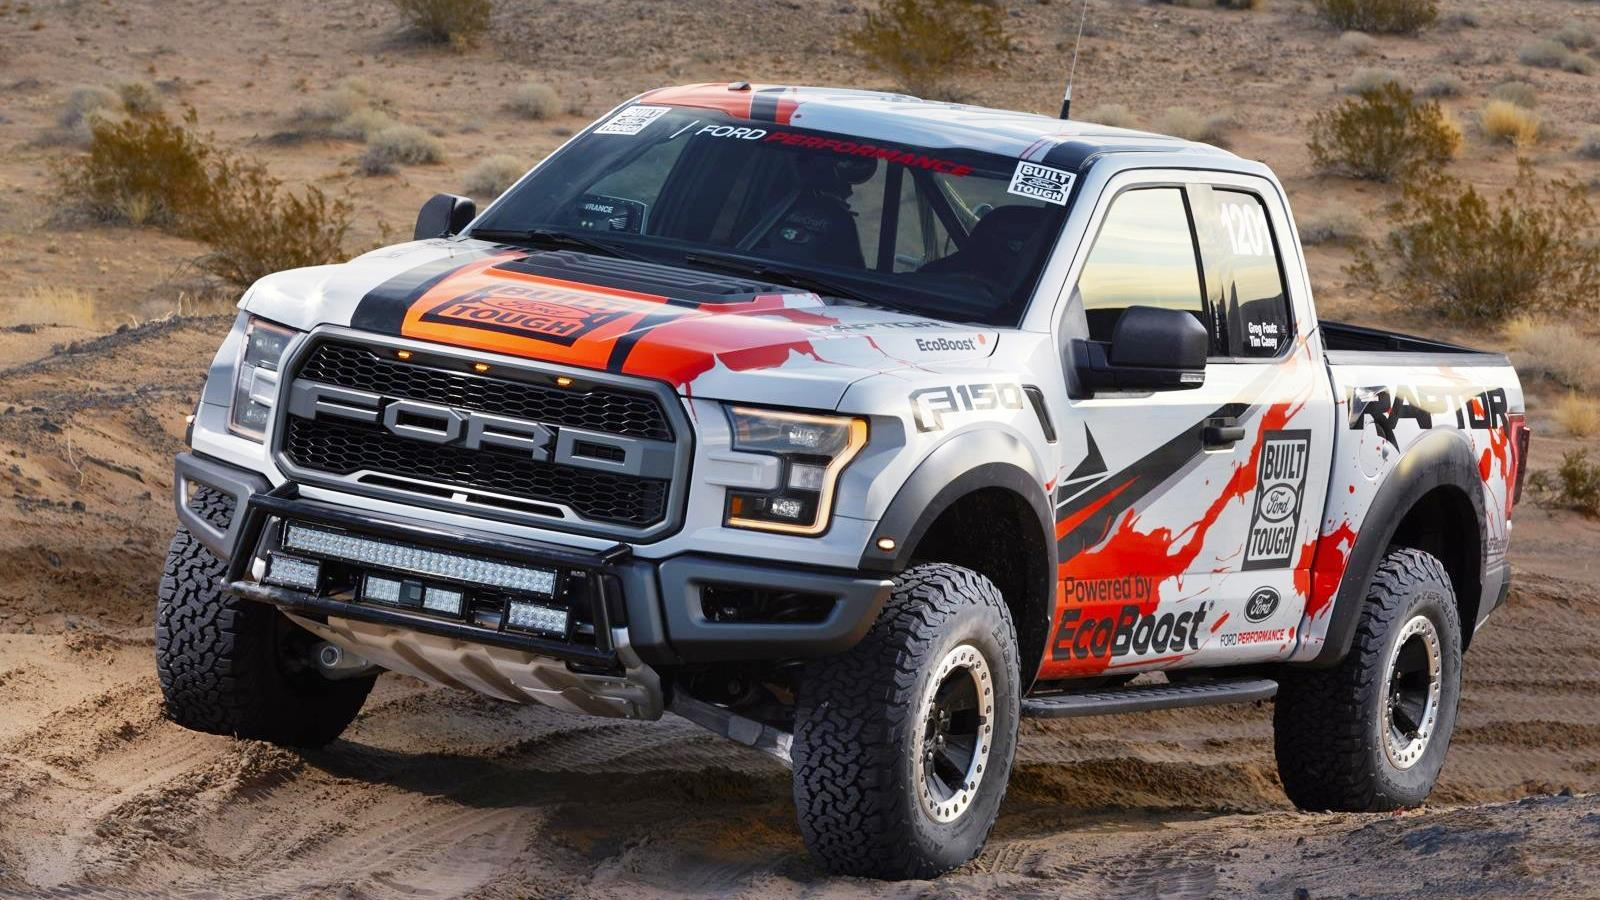 Baja F150 Raptor Race Truck